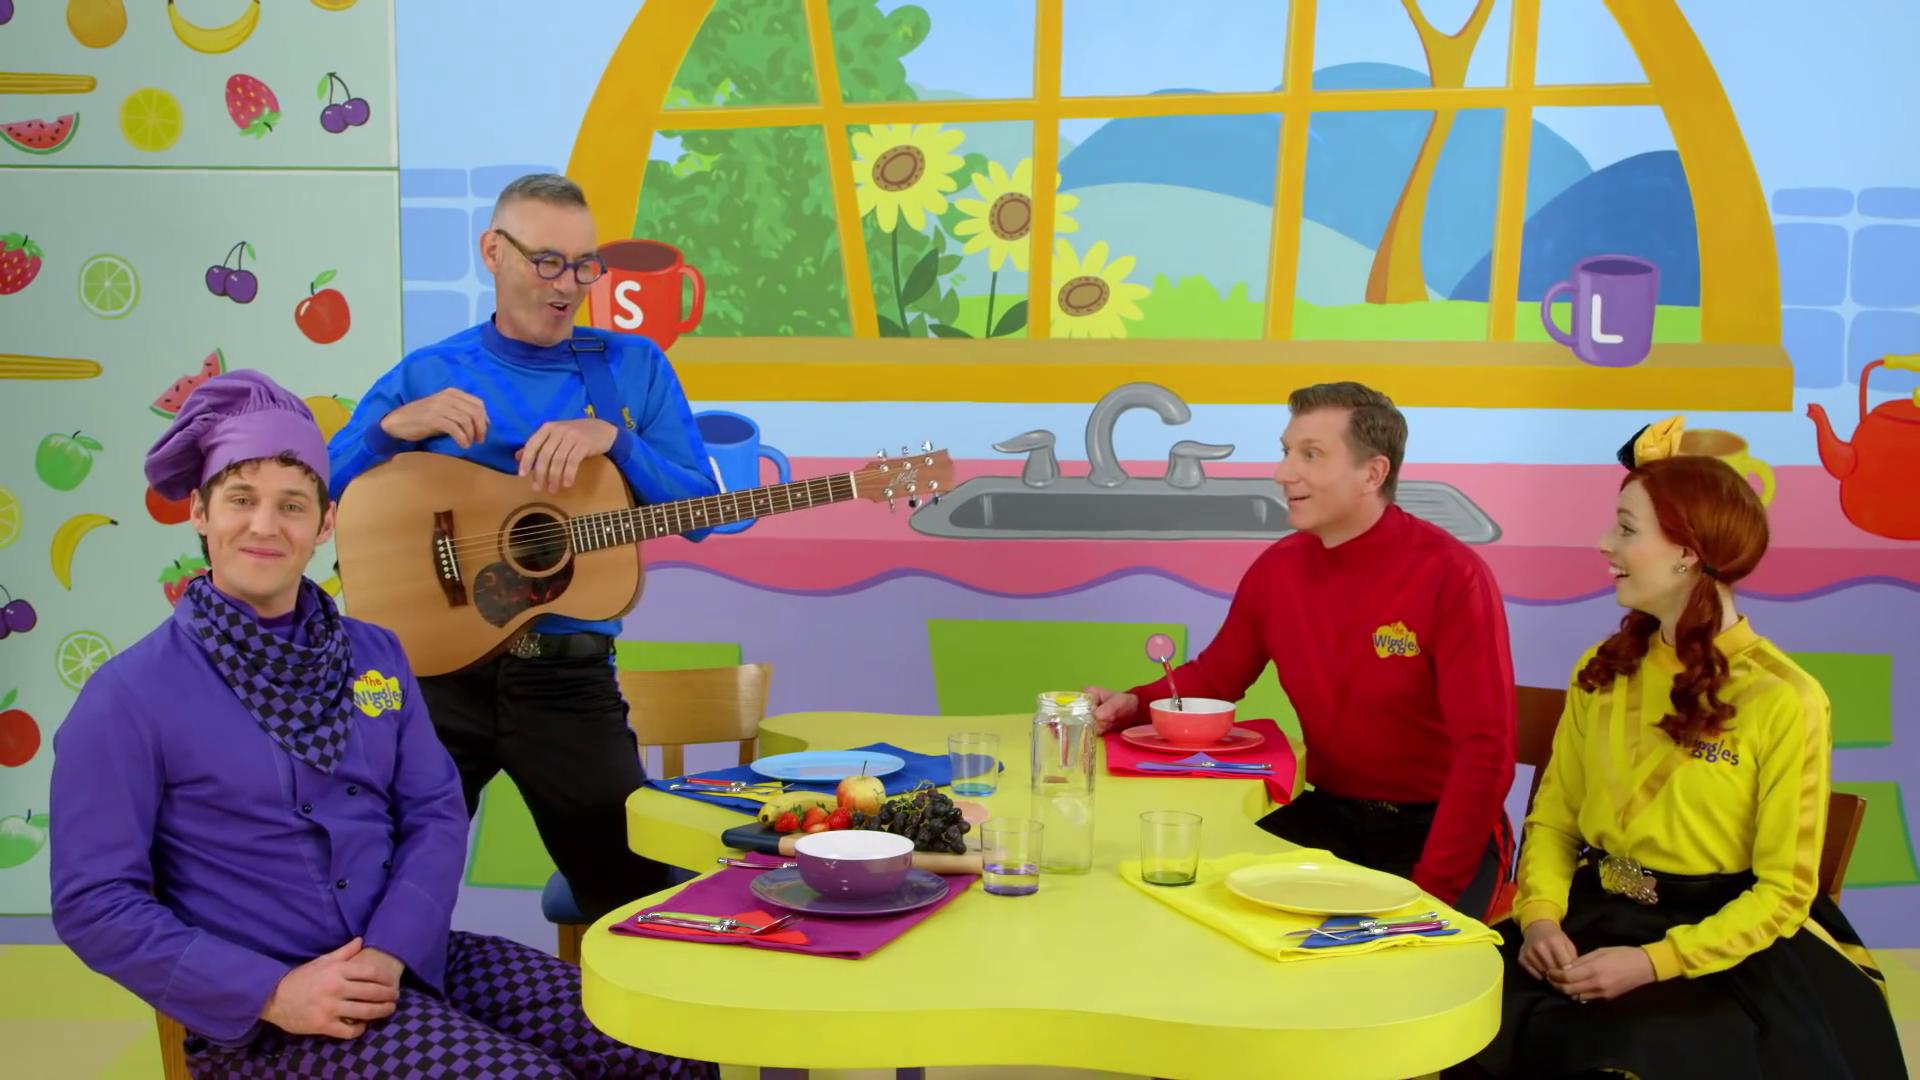 Rock & Roll Preschool (Wiggle Wiggle Wiggle! episode)